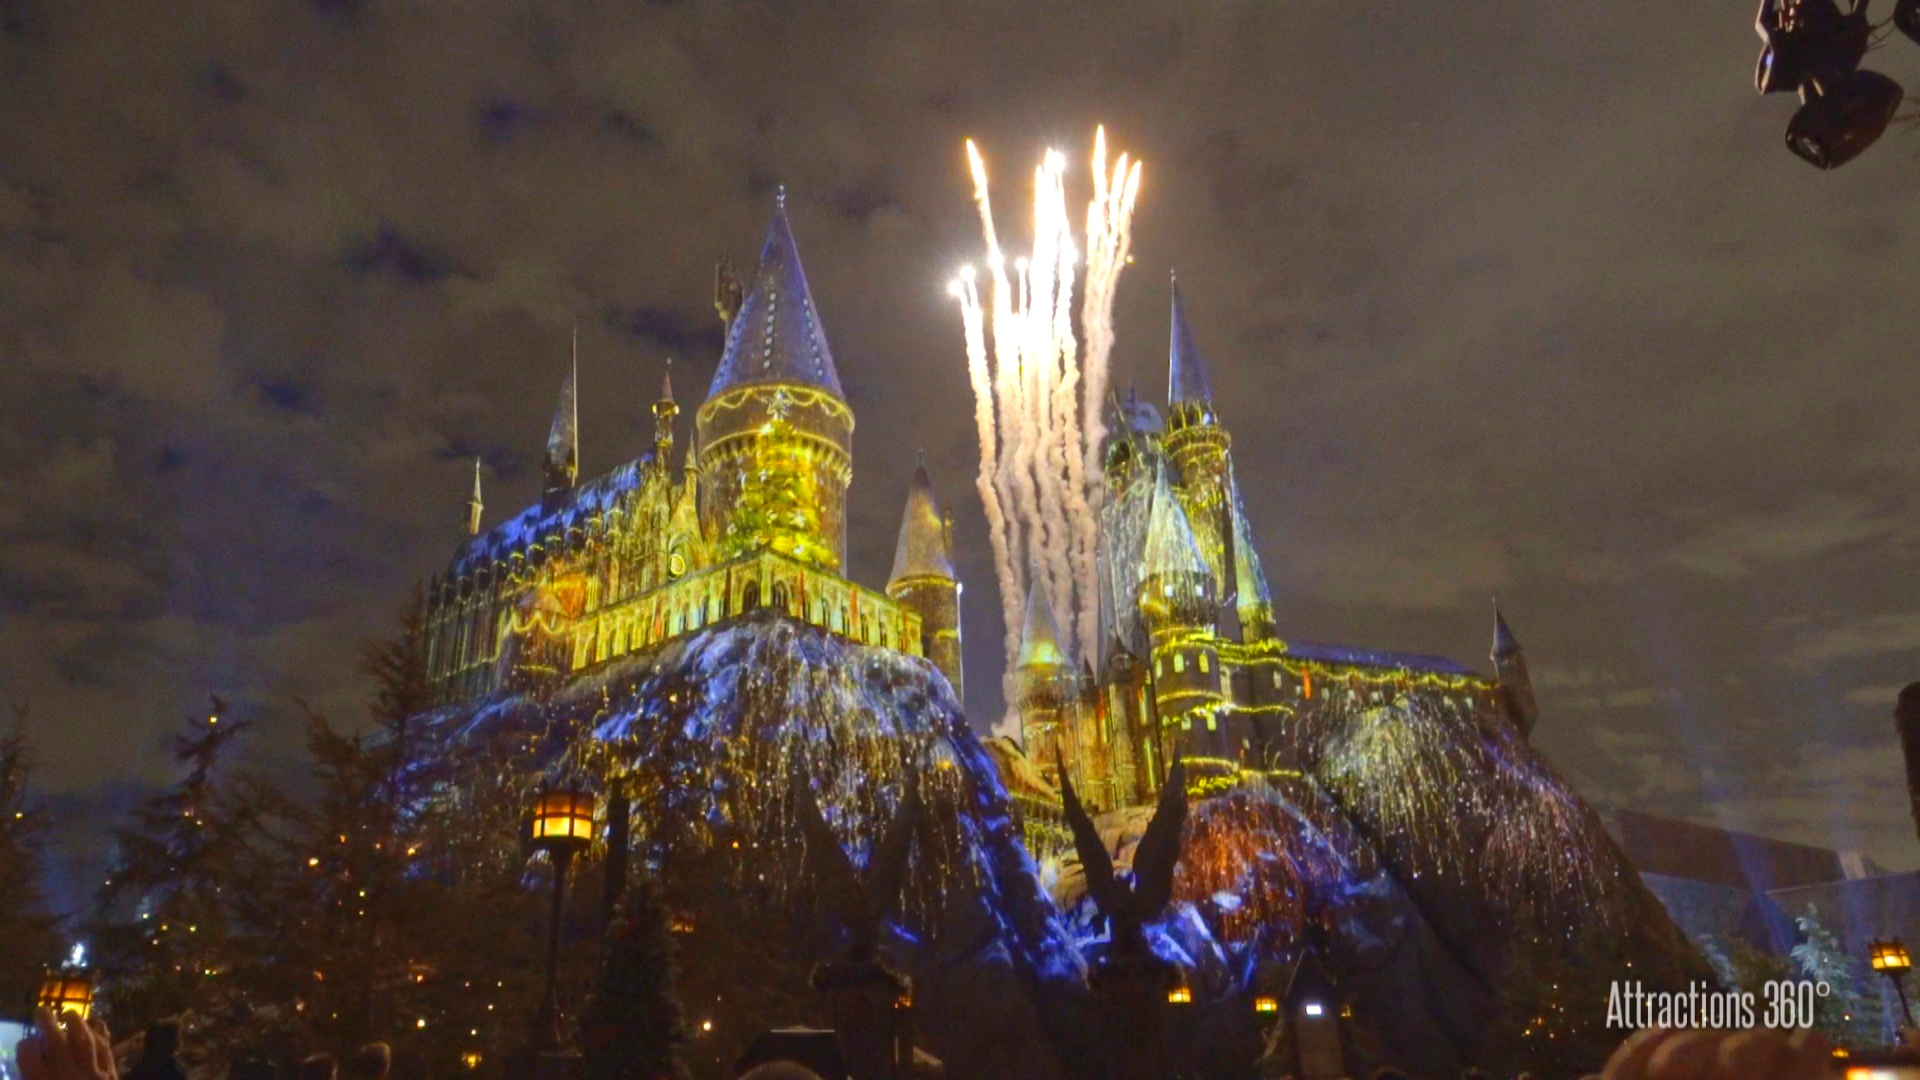 Great Wallpaper Harry Potter Christmas - Image3  2018_279434.jpg?fit\u003d1920%2C1080